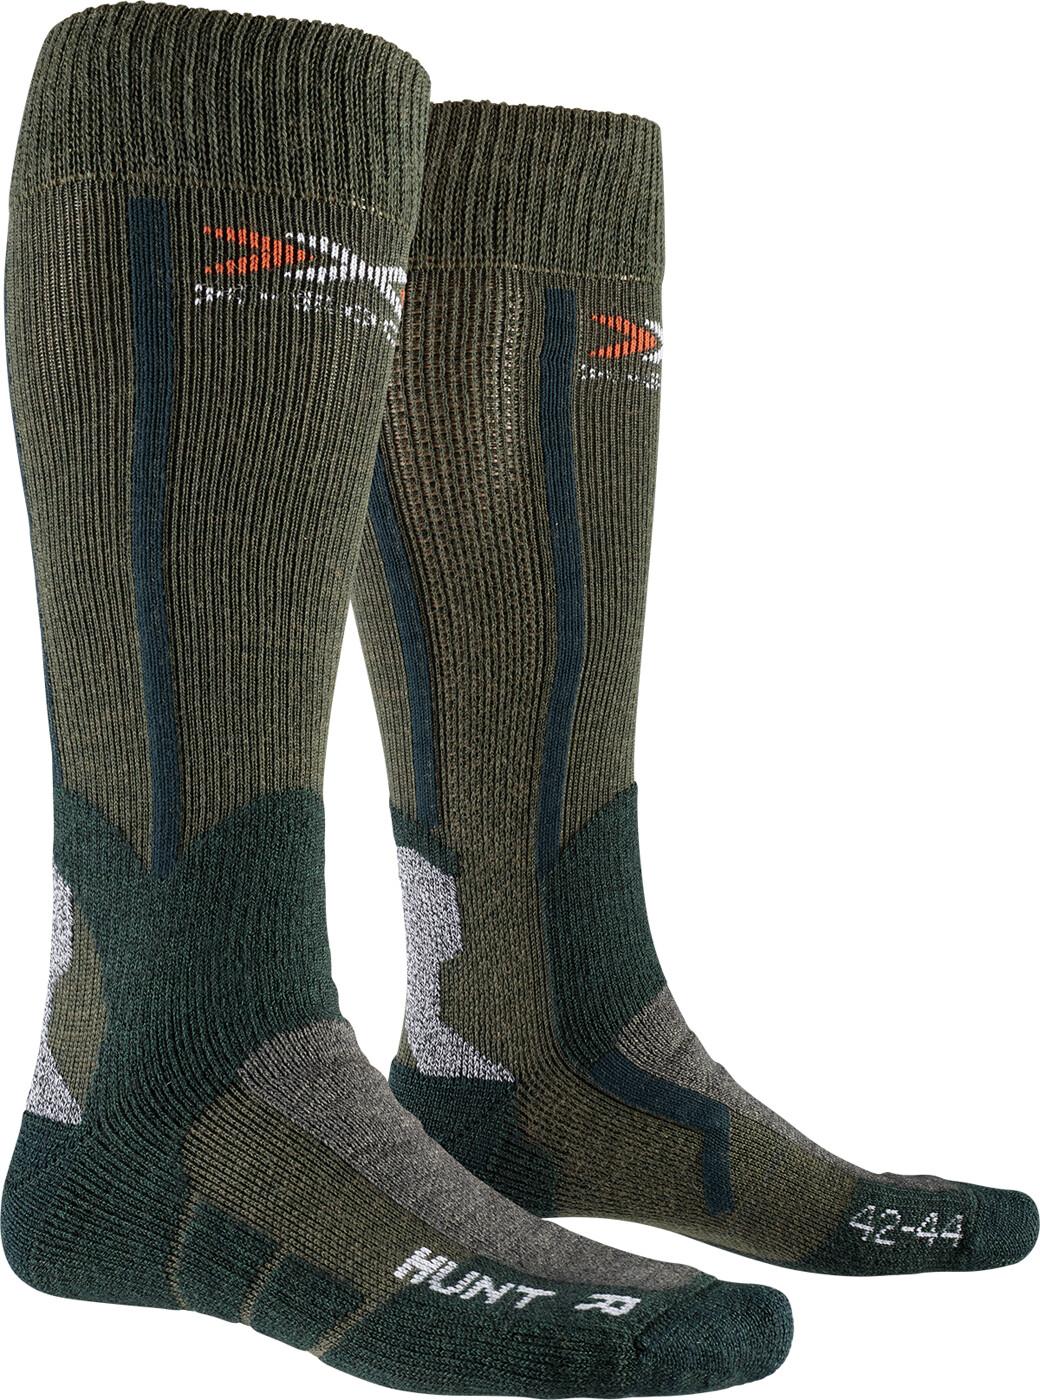 X-BIONIC X-SOCKS® HUNT LONG - Herren